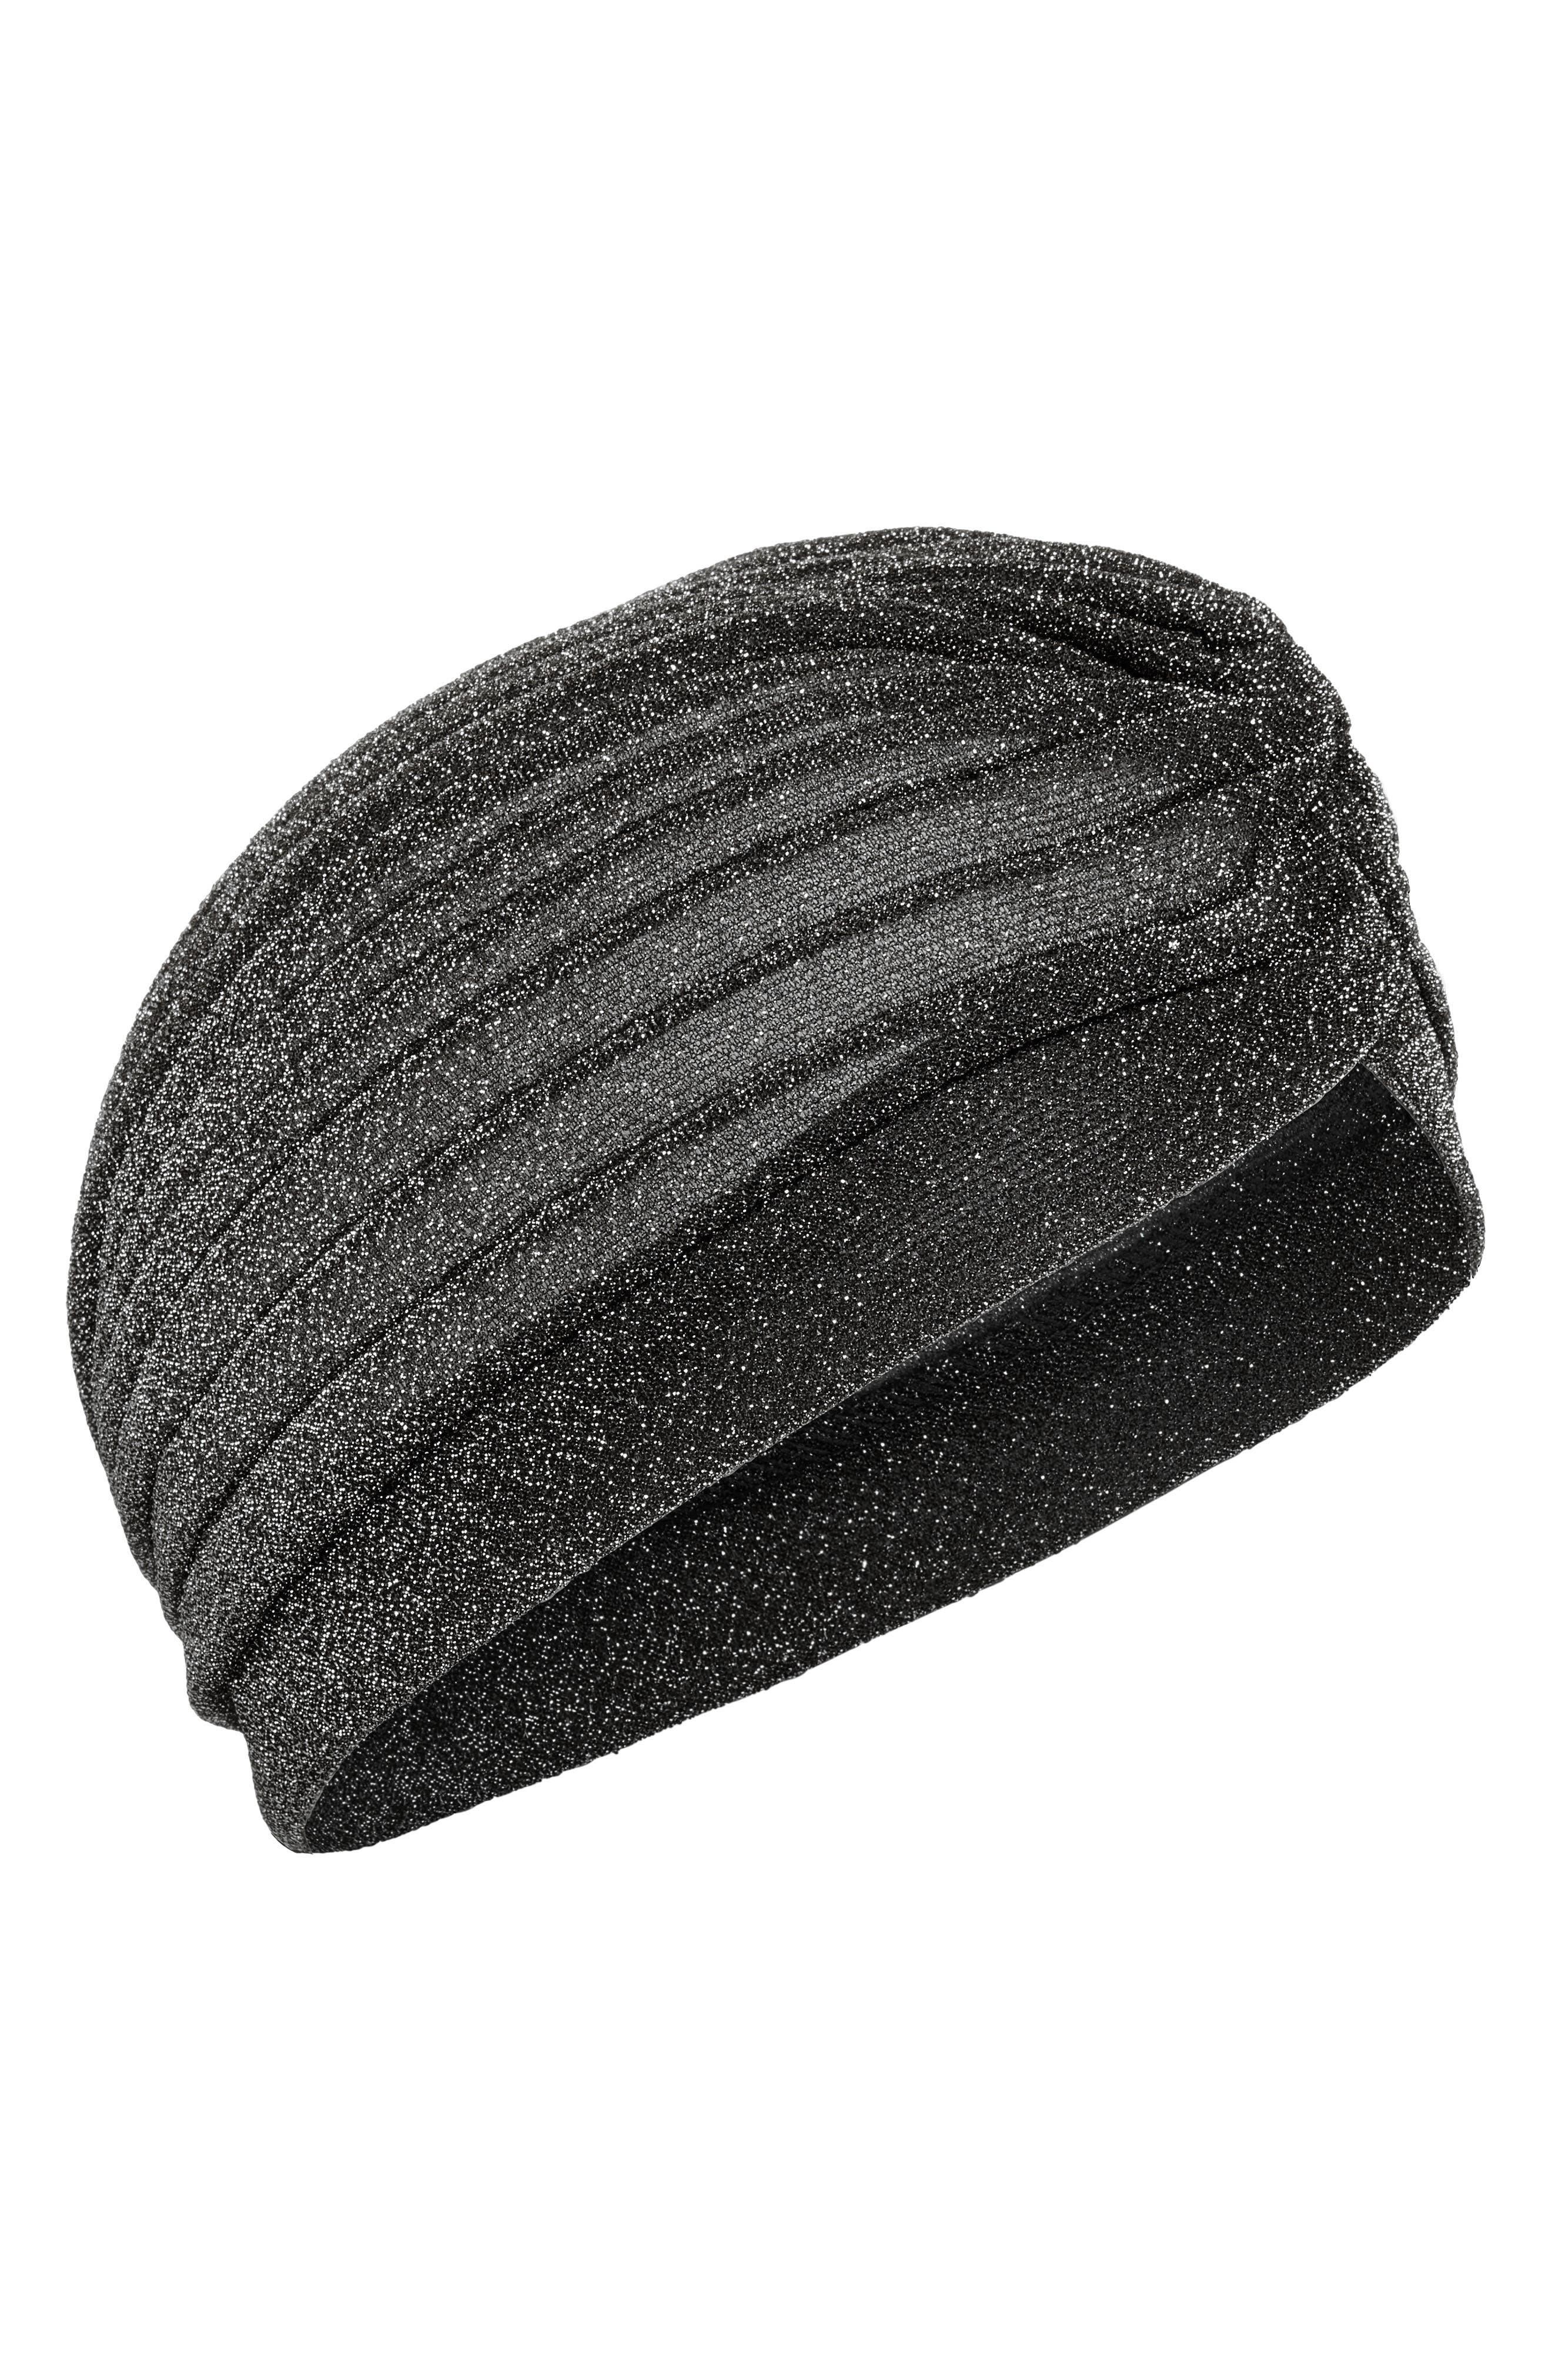 TASHA Metallic Turban, Main, color, 044